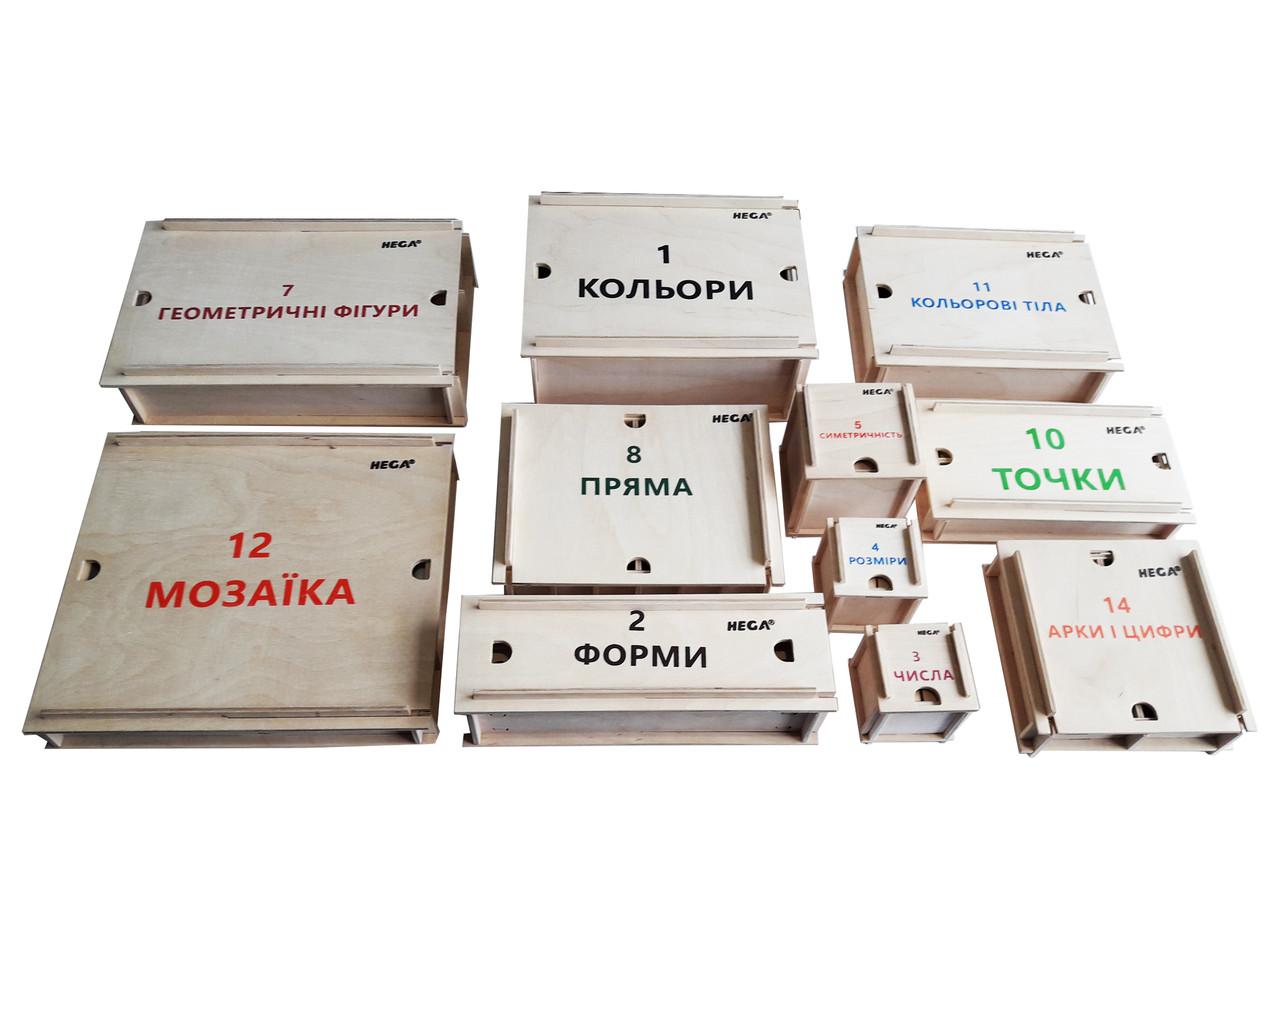 Великий дидактичний набір Фребеля HEGA11 коробок